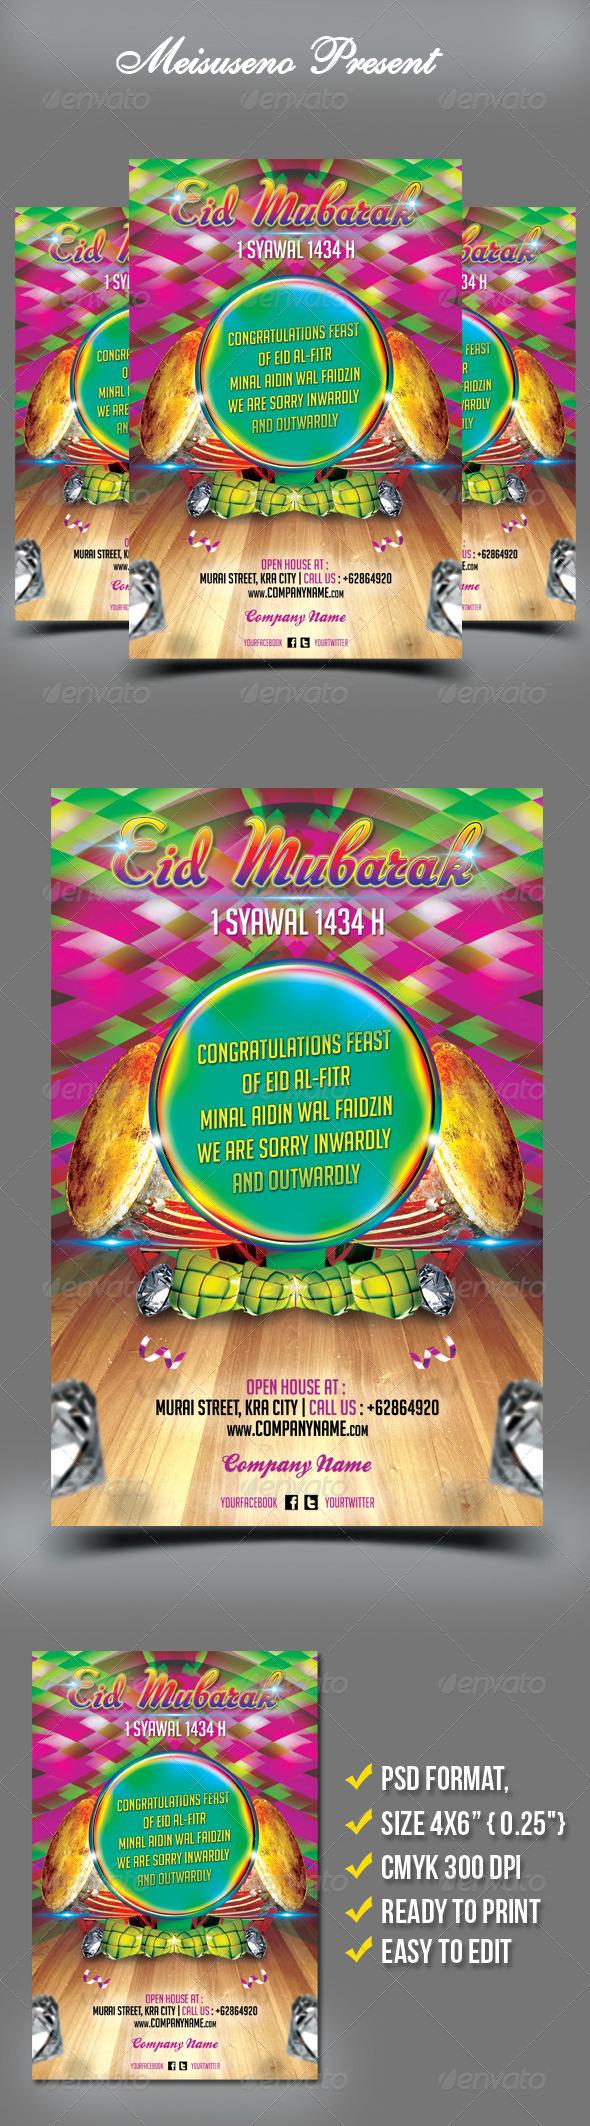 GraphicRiver Eid Mubarak Flyer Greeting Card 5126508